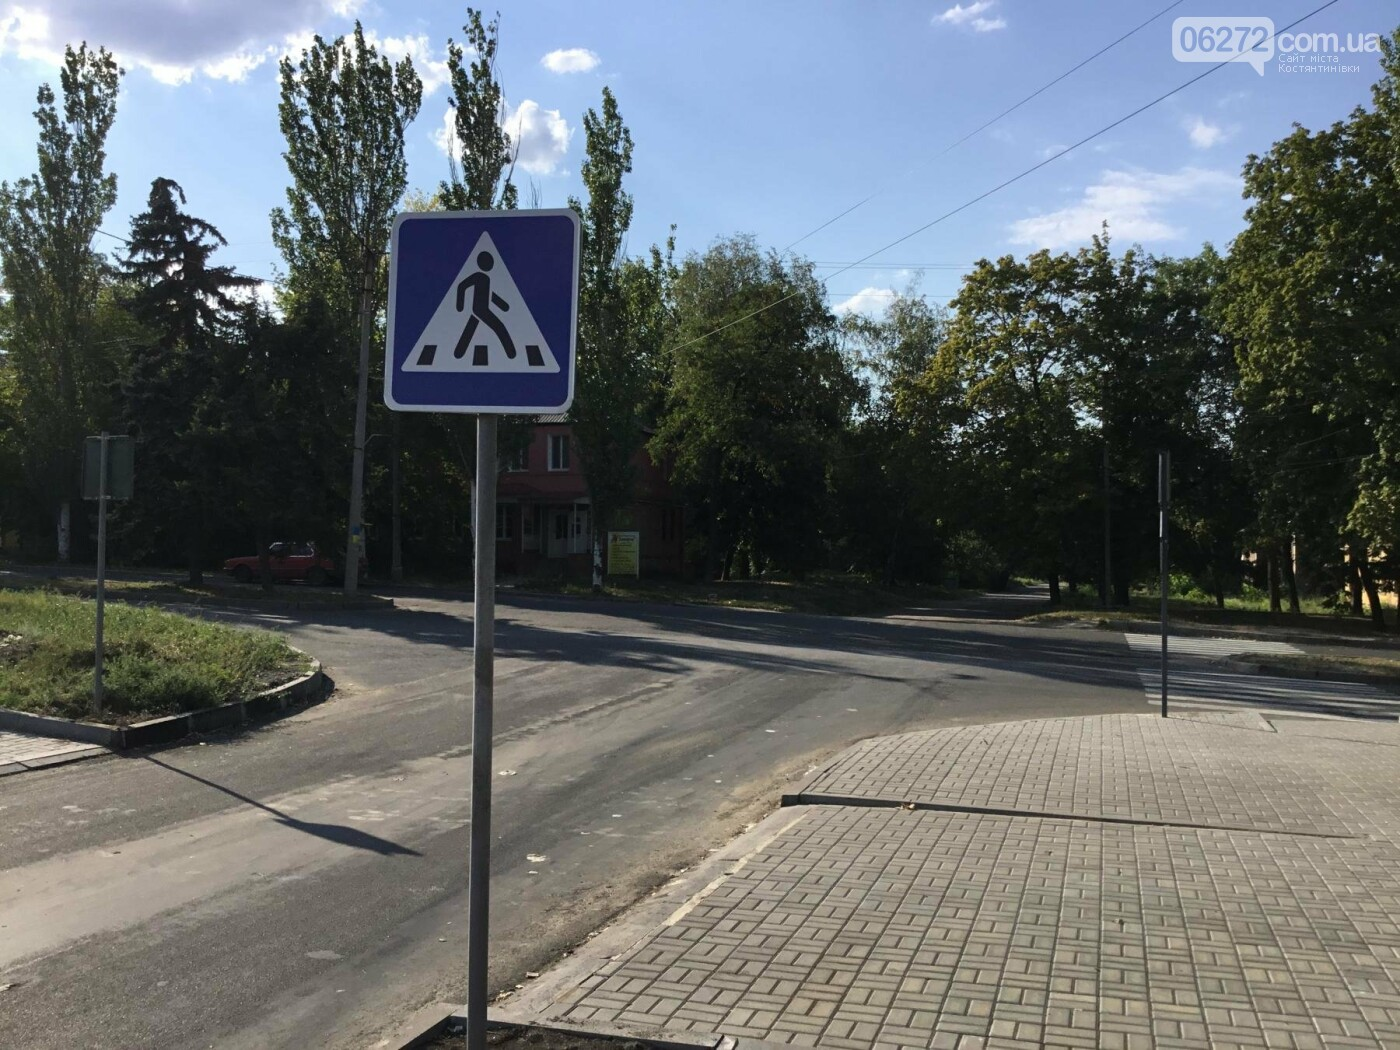 Дорога после ремонта по ул. Леваневского в Константиновке, фото-9